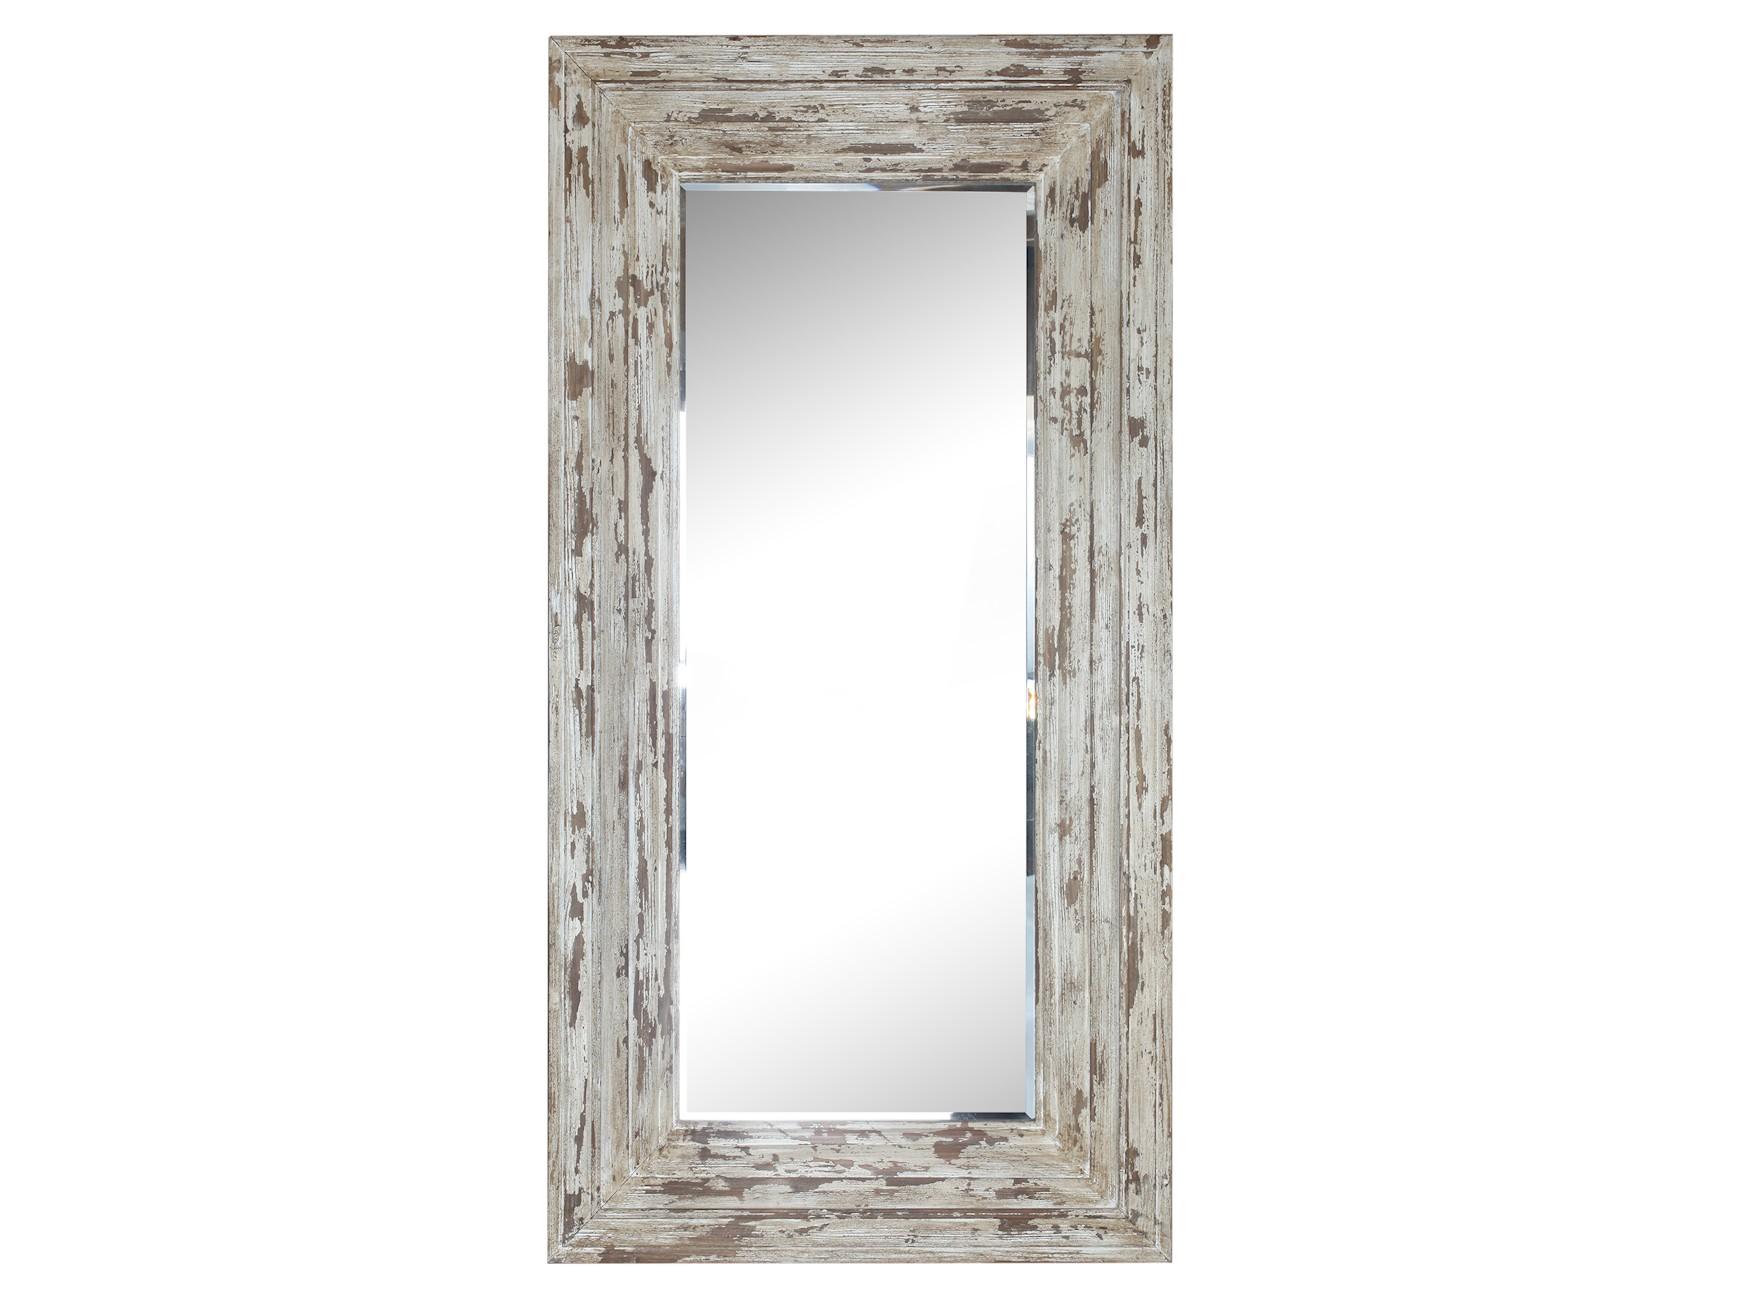 Зеркало настенноеНастенные зеркала<br>&amp;lt;span style=&amp;quot;line-height: 24.9999px;&amp;quot;&amp;gt;Вес 8 кг.&amp;lt;/span&amp;gt;<br><br>Material: Дерево<br>Ширина см: 76<br>Высота см: 100<br>Глубина см: 5